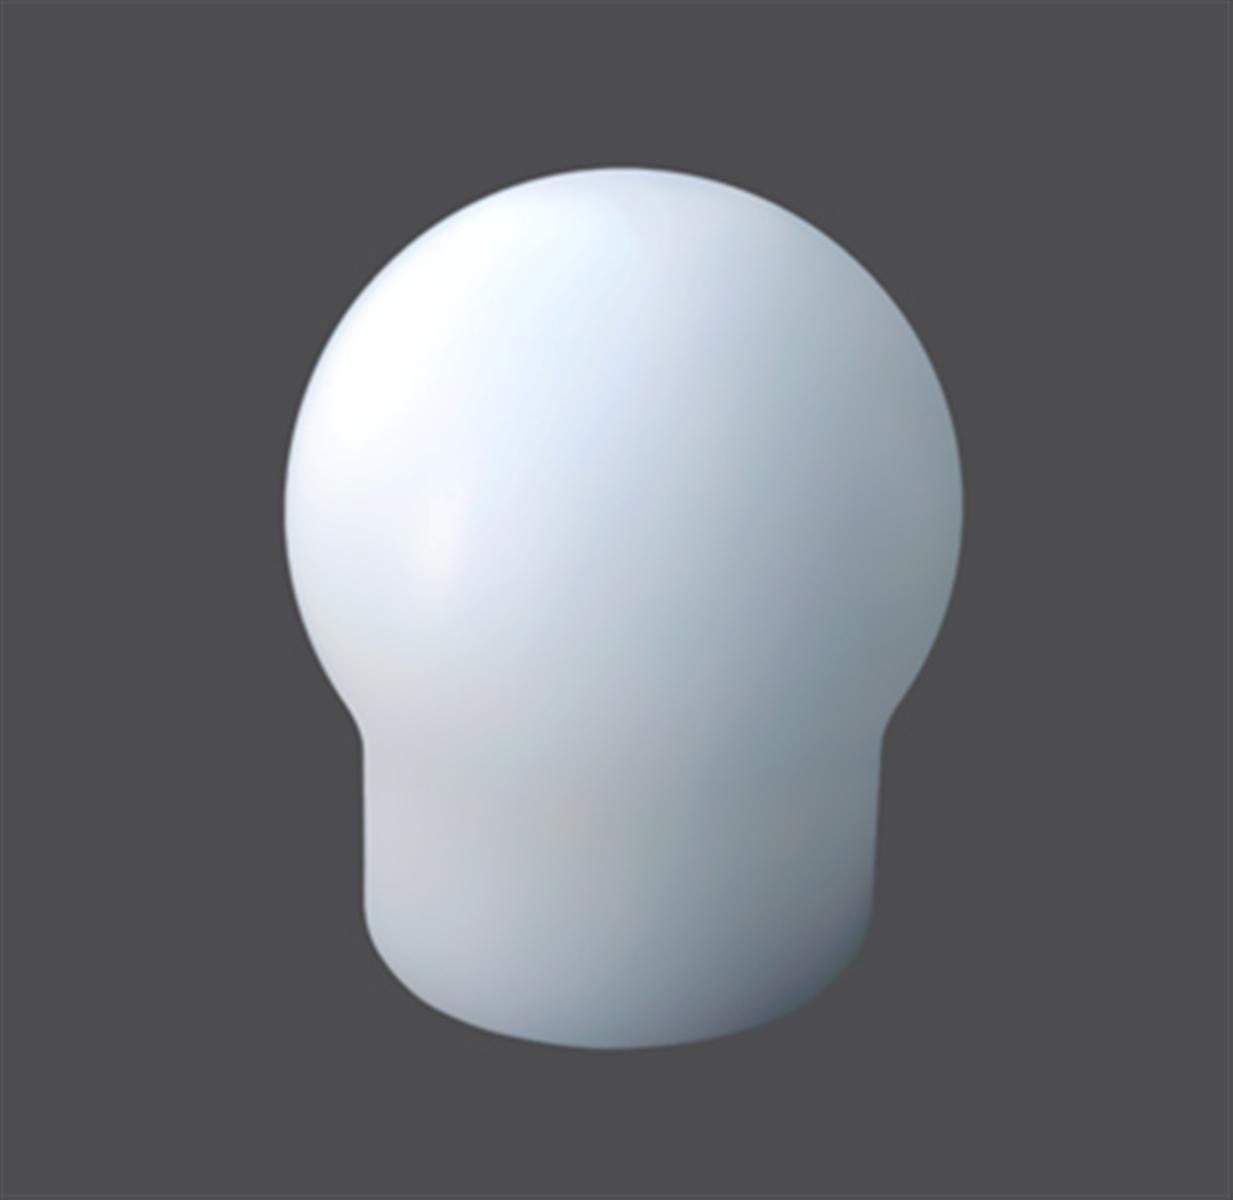 Ahead Tip MBT Mini Ball Tip Nylon / Ersatztip / Replacement-Tip